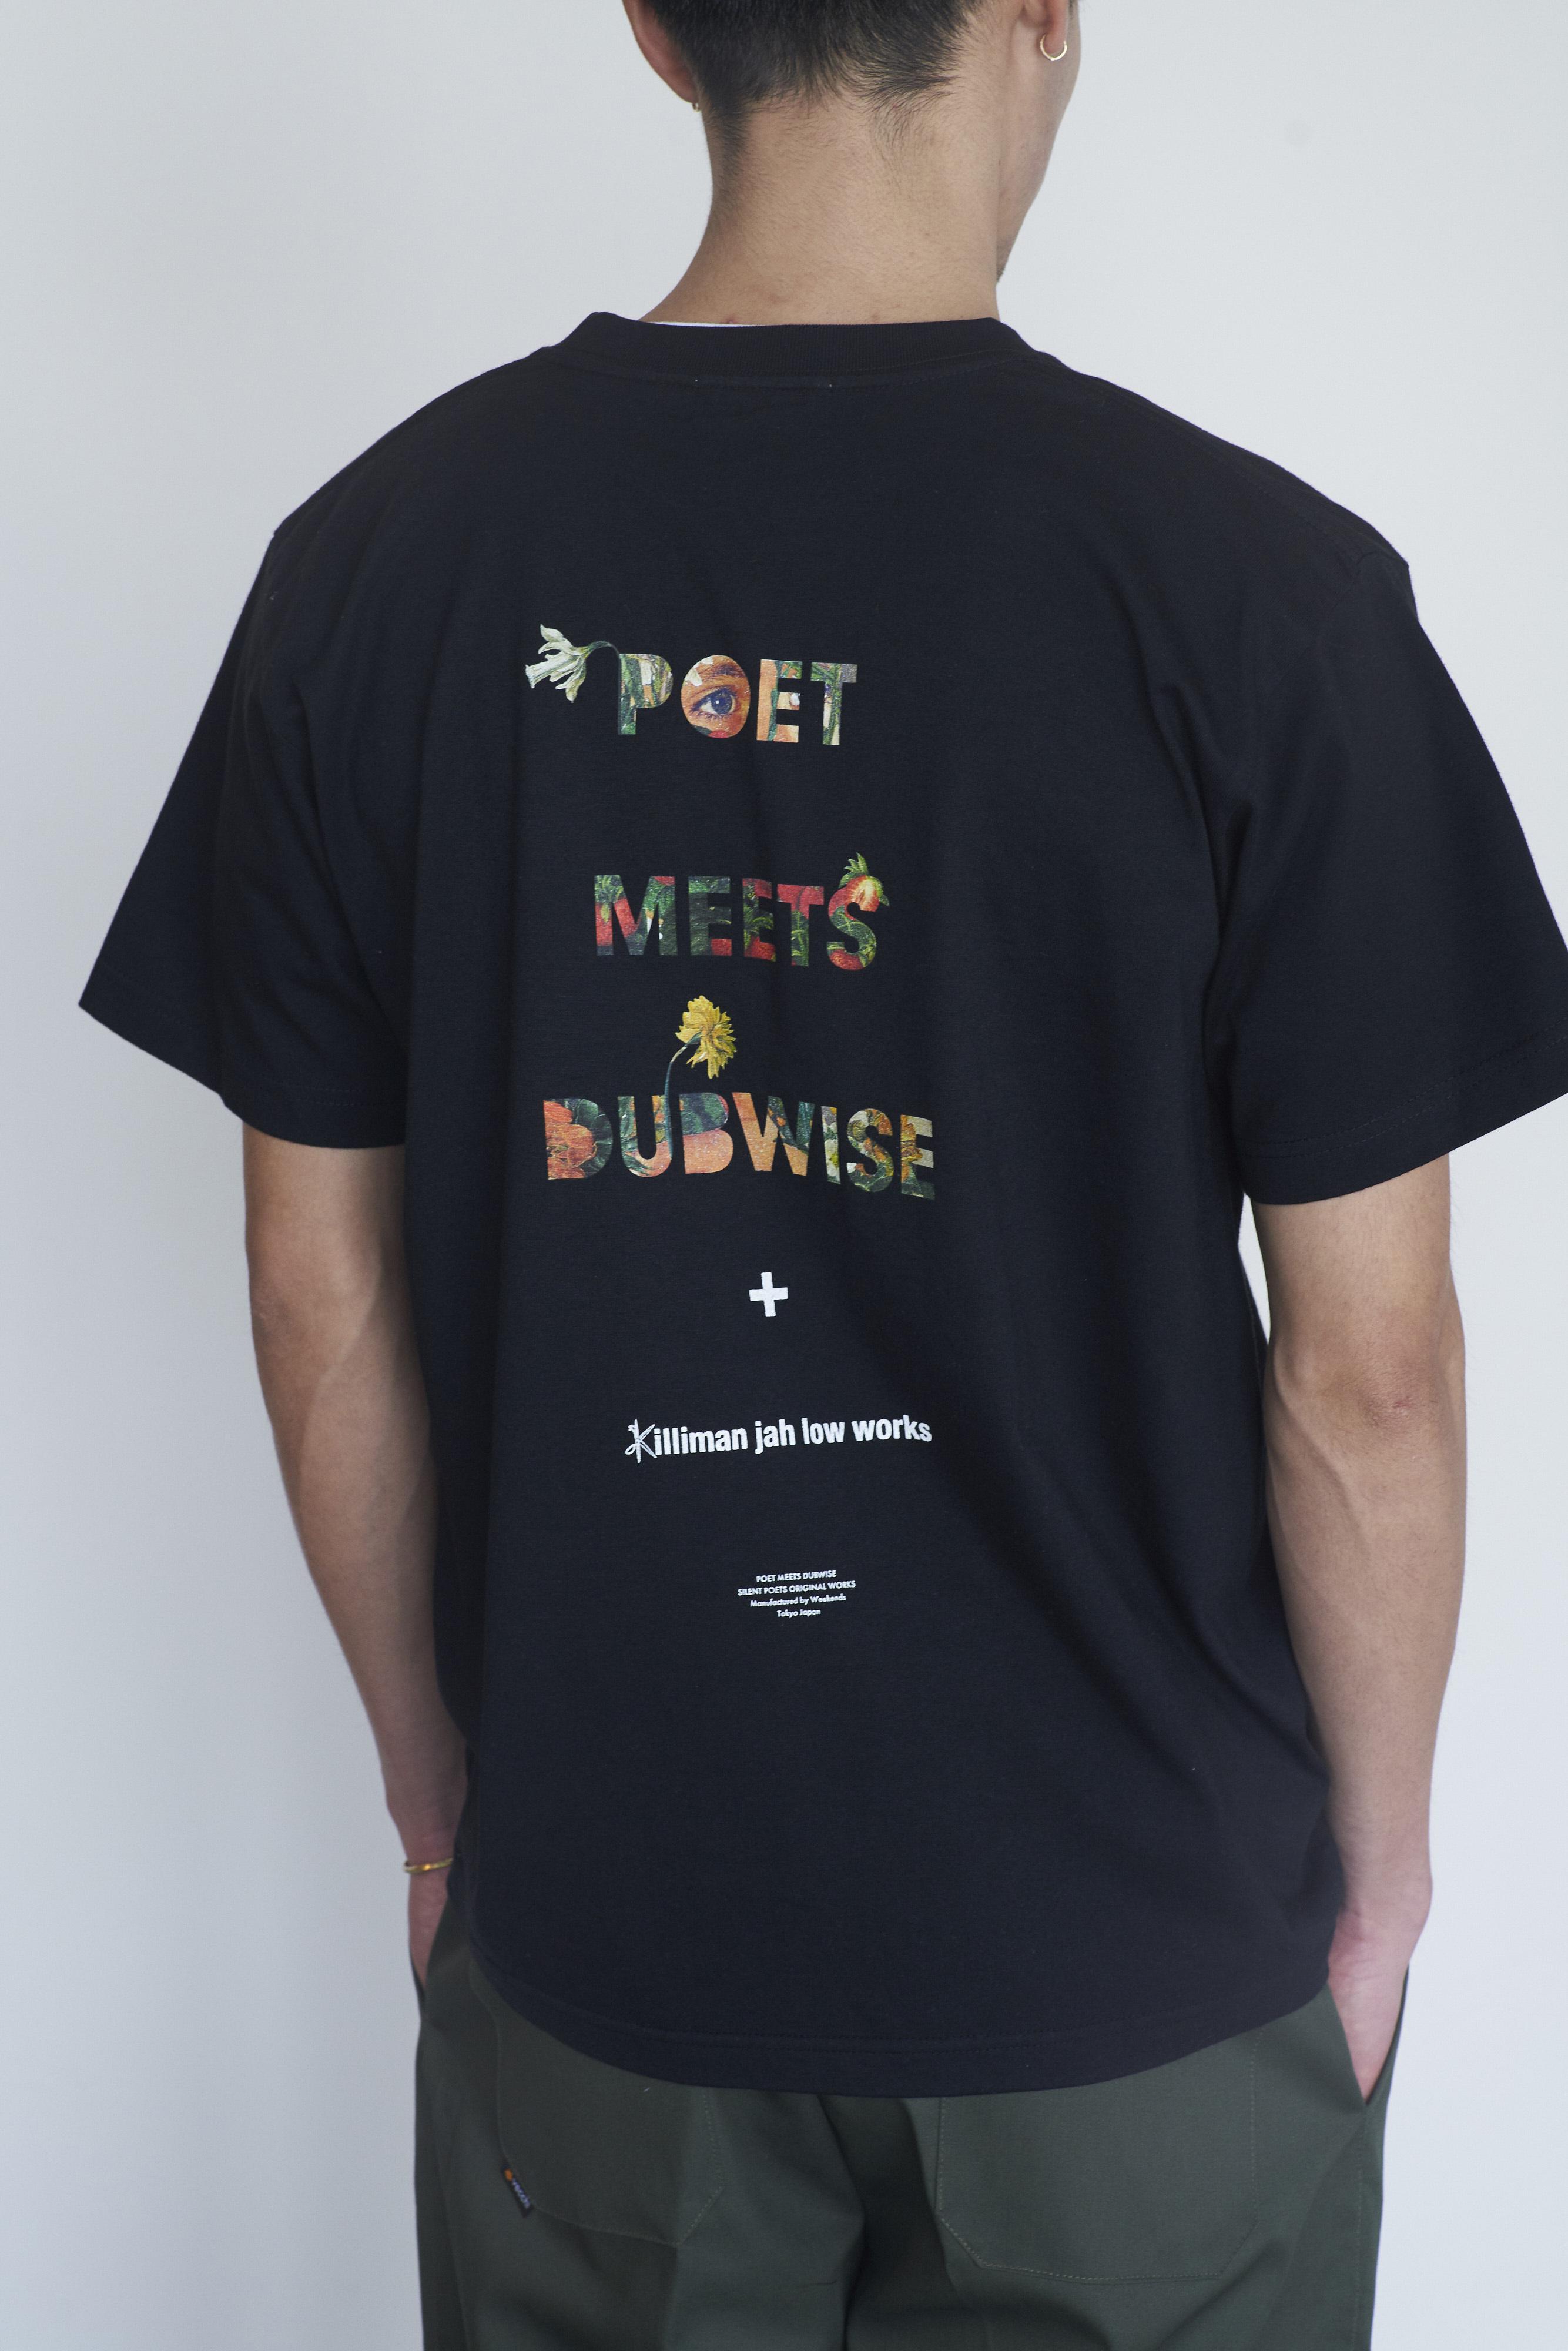 POET MEETS DUBWISE Killiman Jah Low Works PMD Logo Collage Inkjet T-shirt